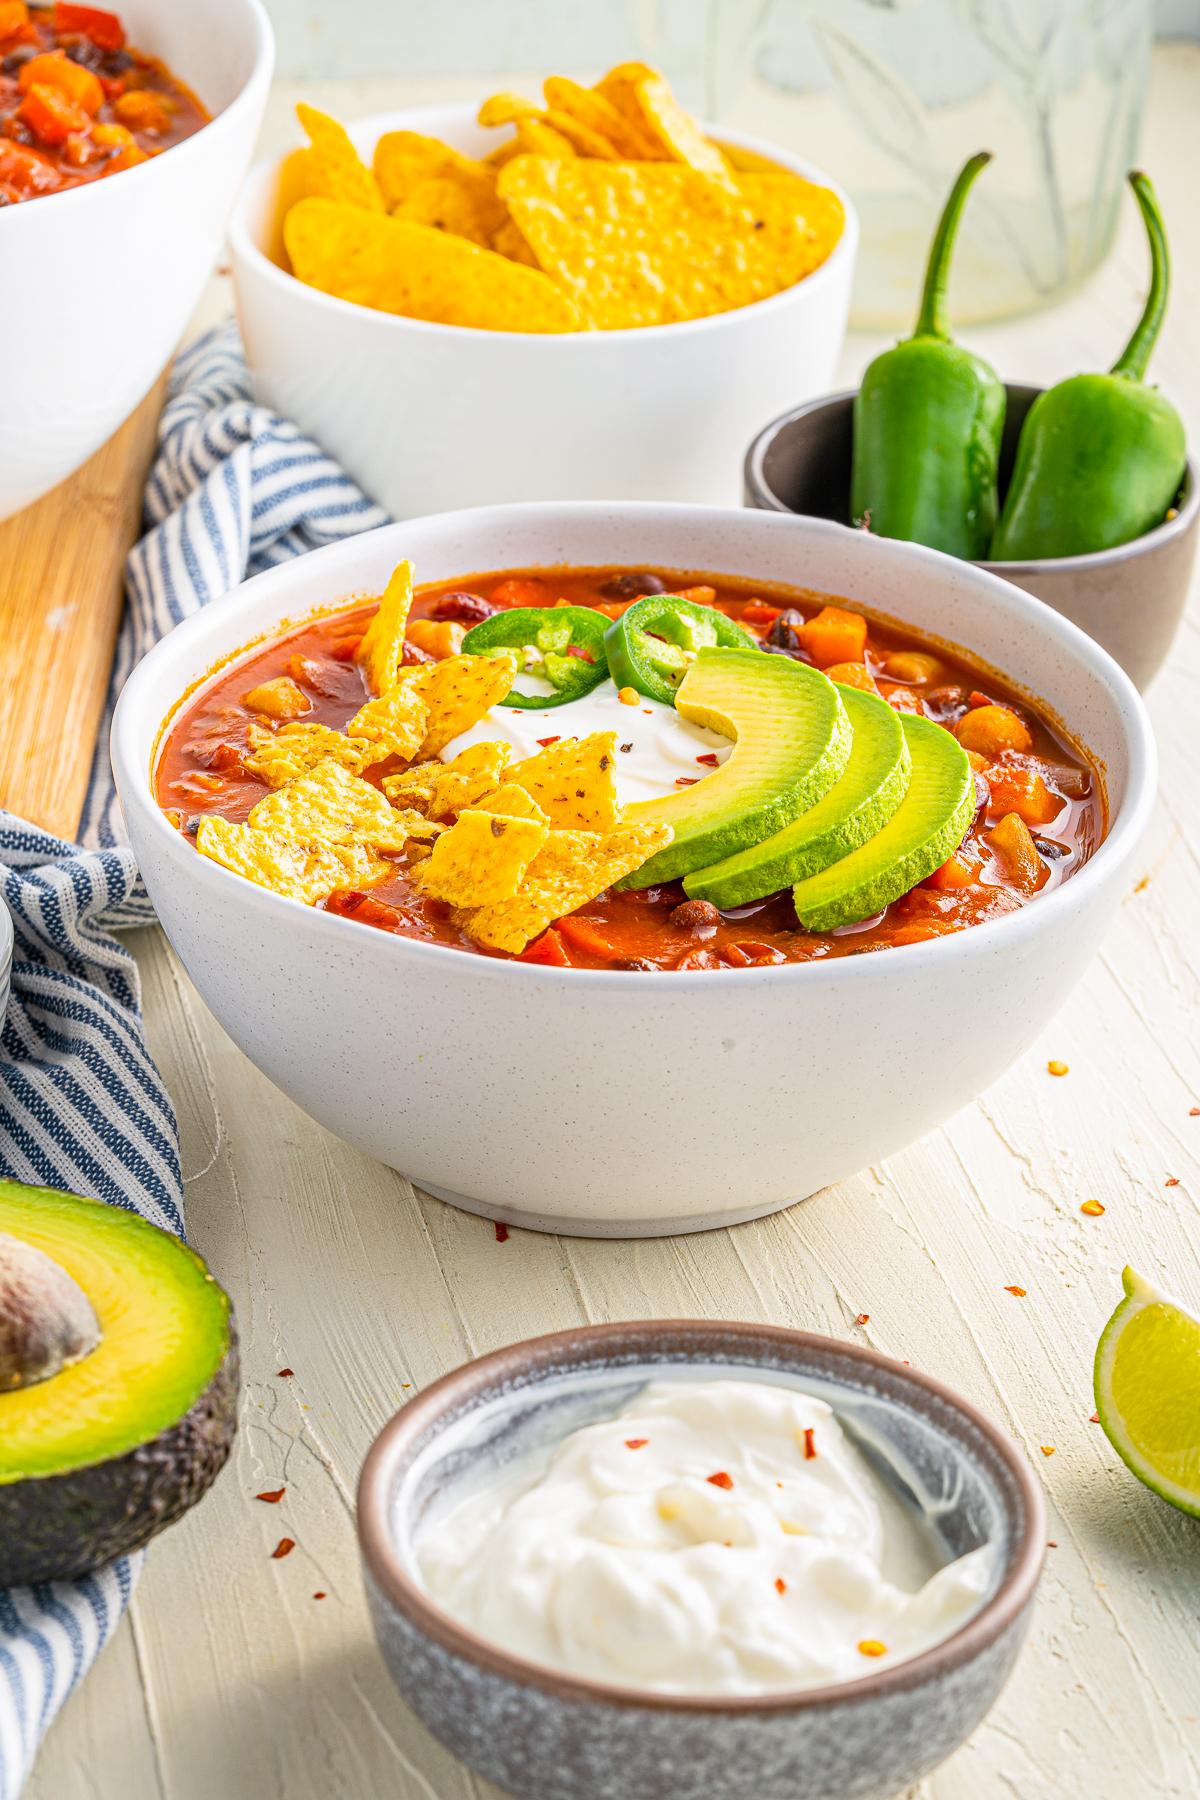 Vegetarian Chili Recipe in bowl with garnishes and garnishes around bowl.